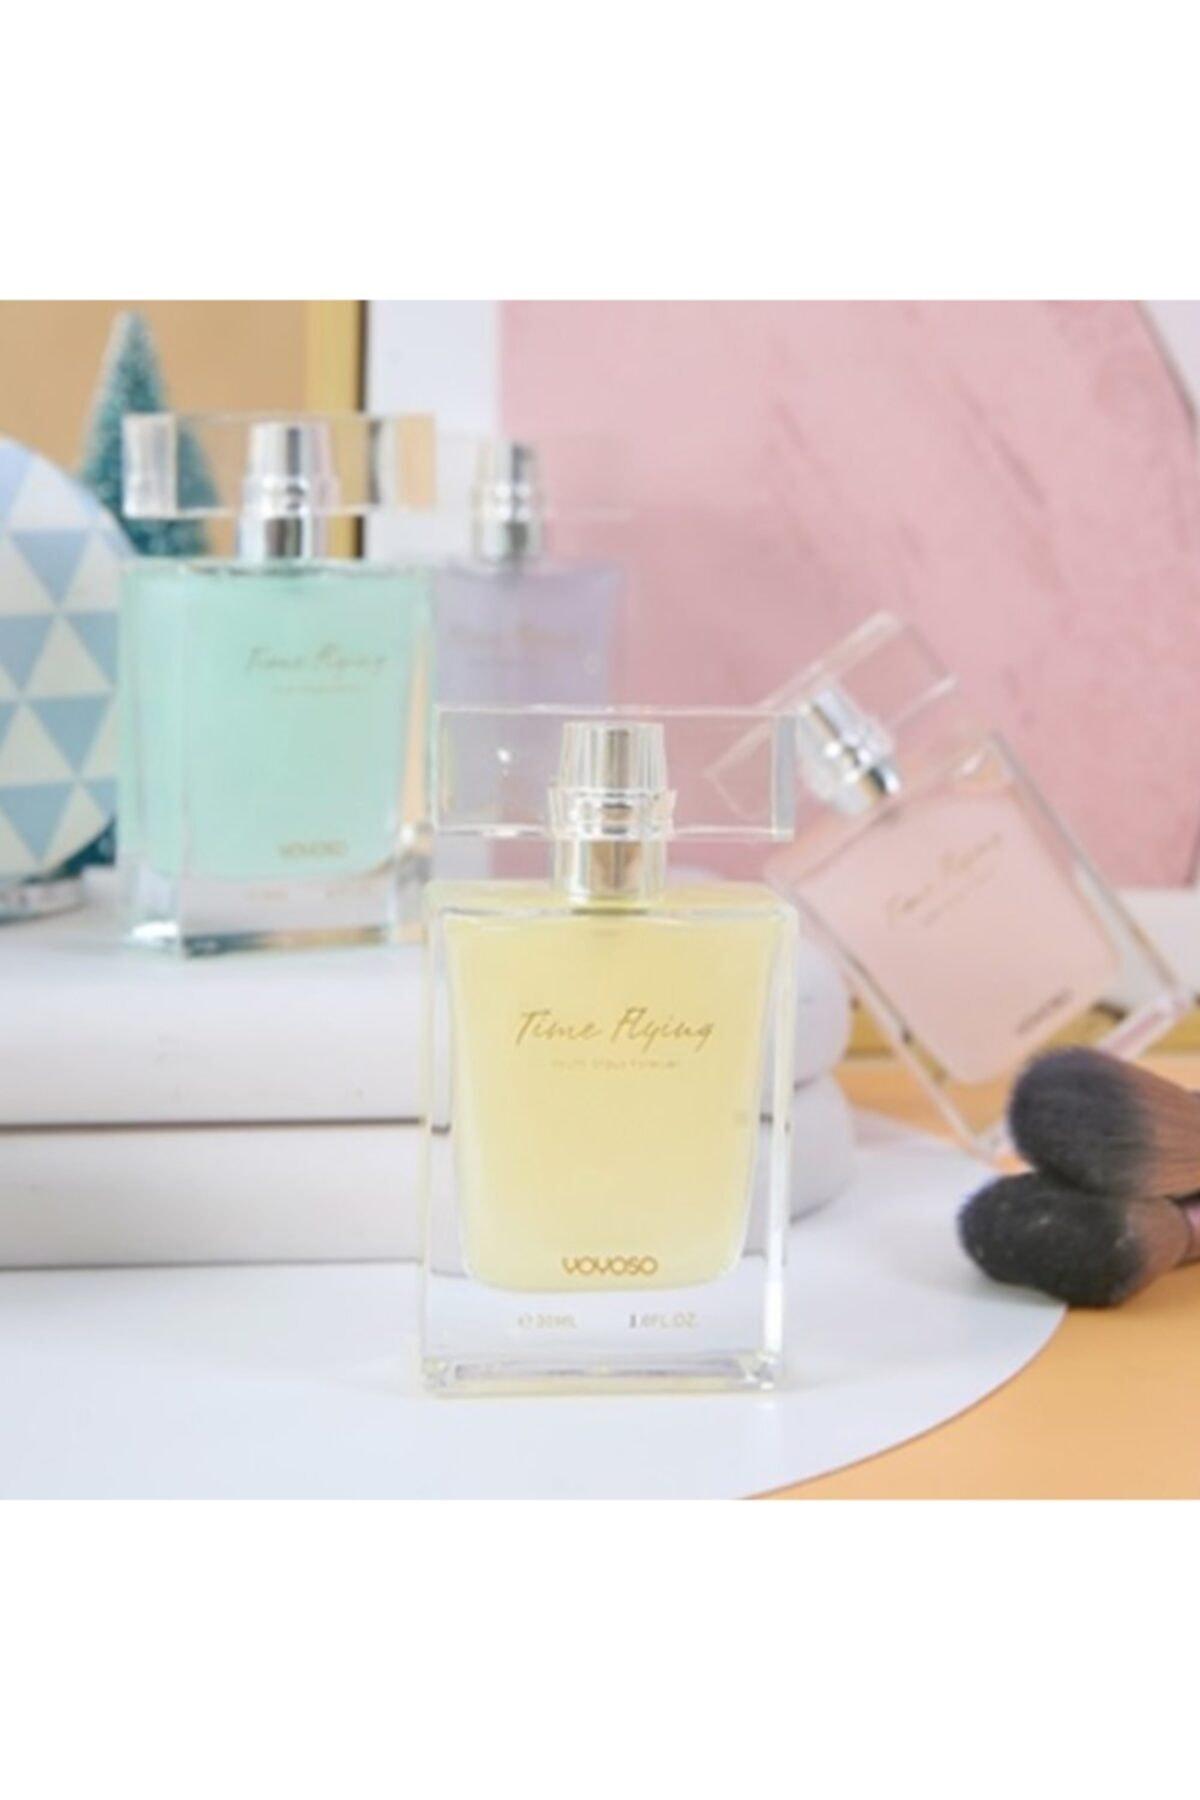 YOYOSO Time Flying Kadın Parfüm Gold 1